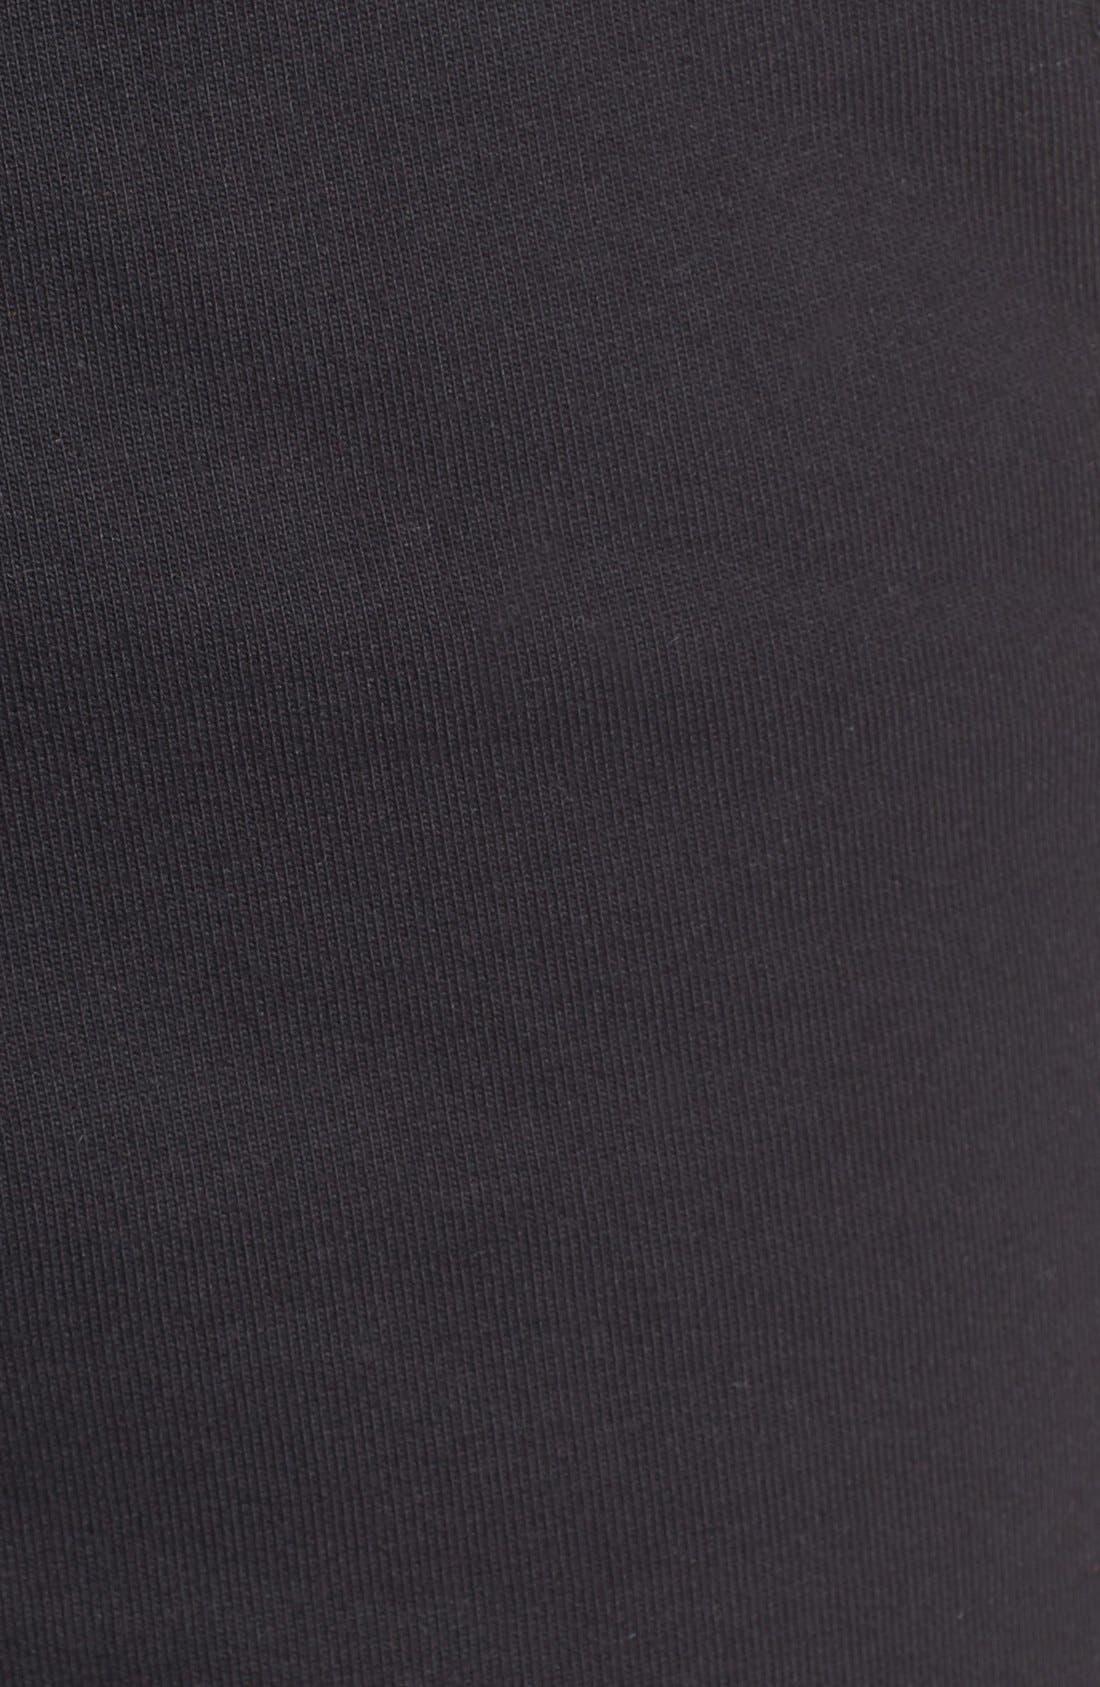 'NSW' Logo French Terry Shorts,                             Alternate thumbnail 3, color,                             BLACK/ WHITE